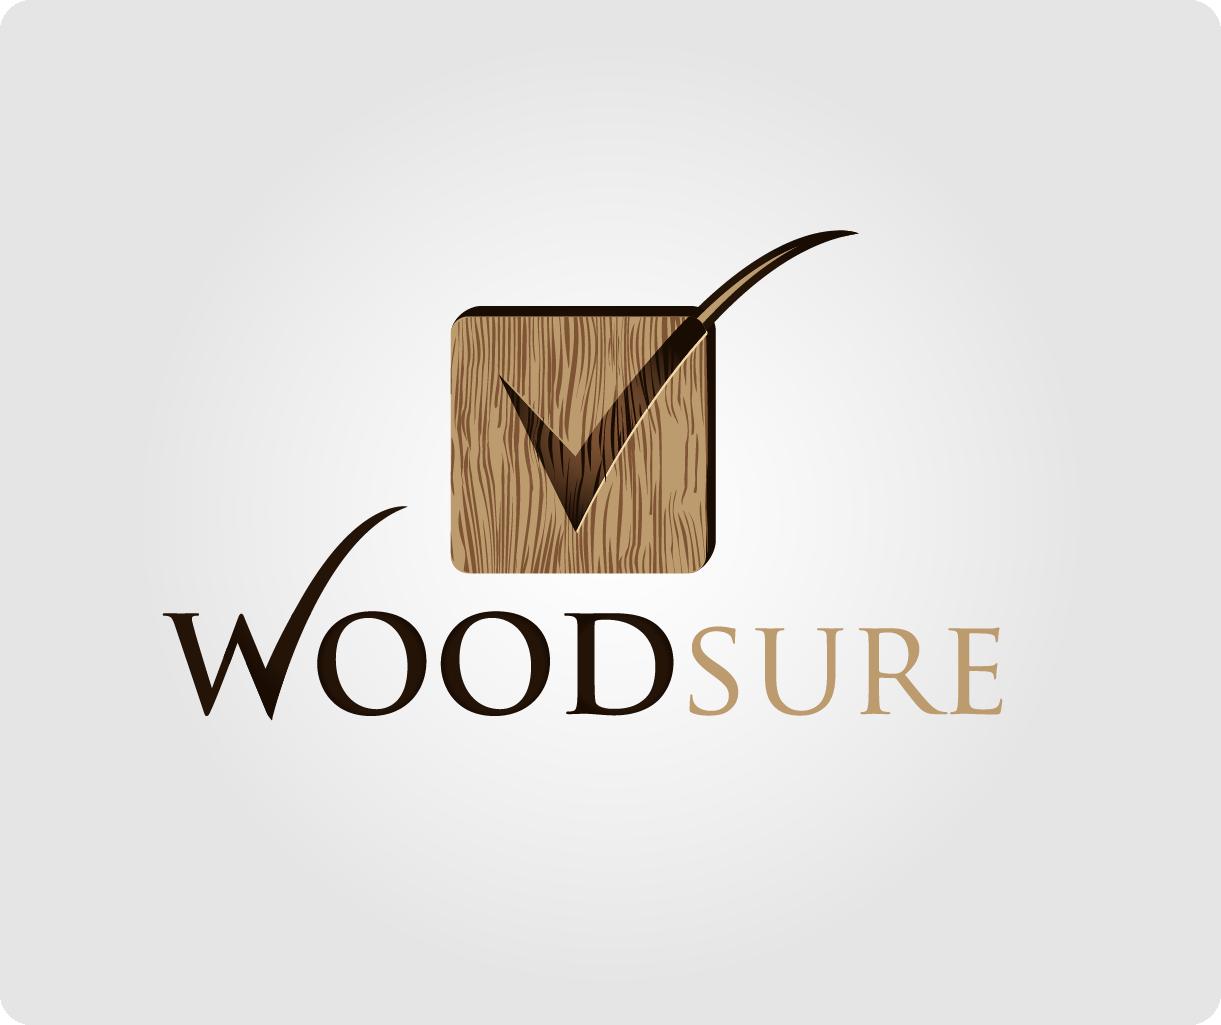 Create the next logo for WOODsure